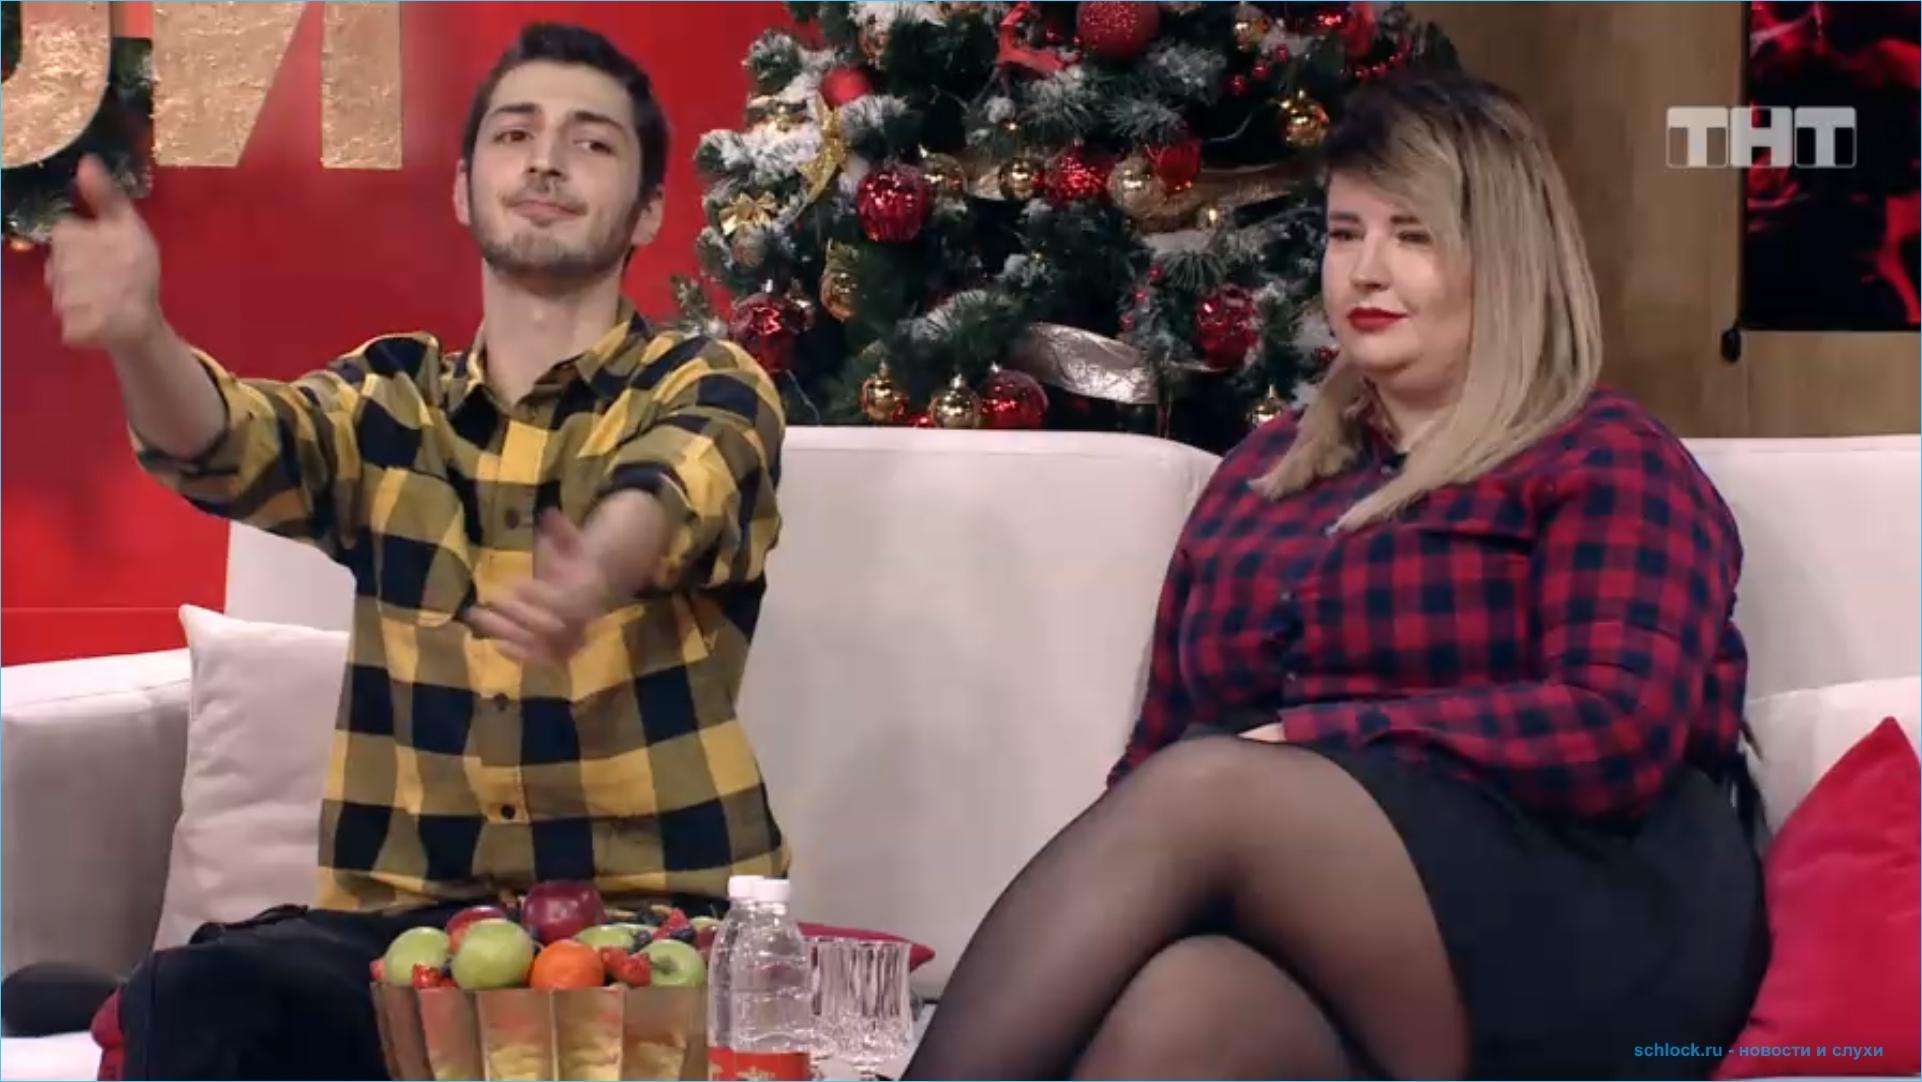 Юля Романова опозорилась на съемках шоу